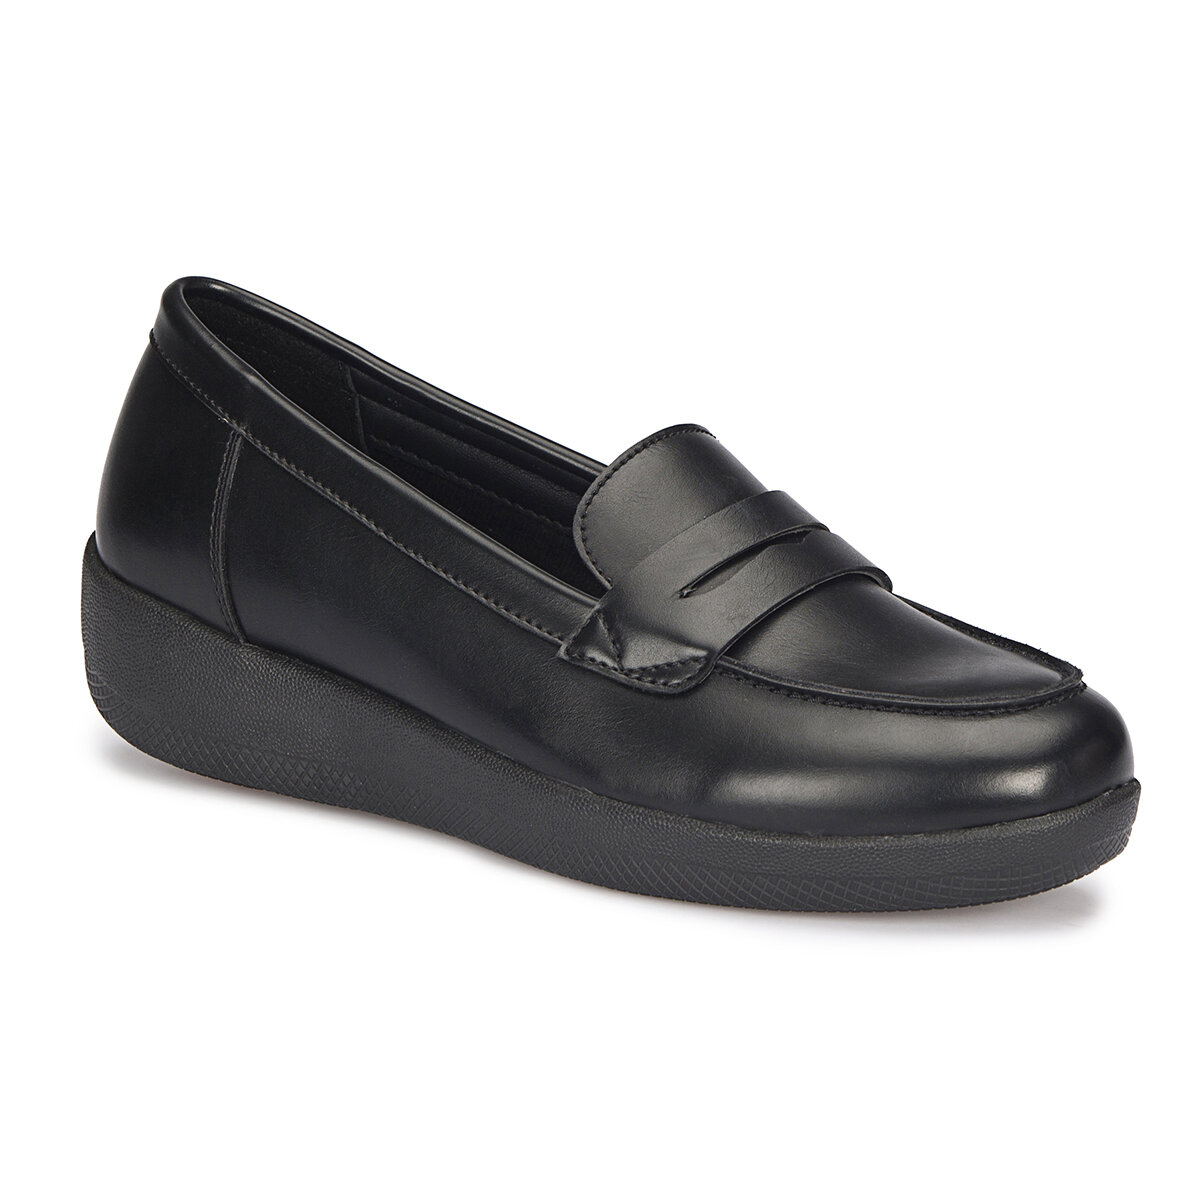 FLO 72. 110195.Z Black Women Shoes Polaris